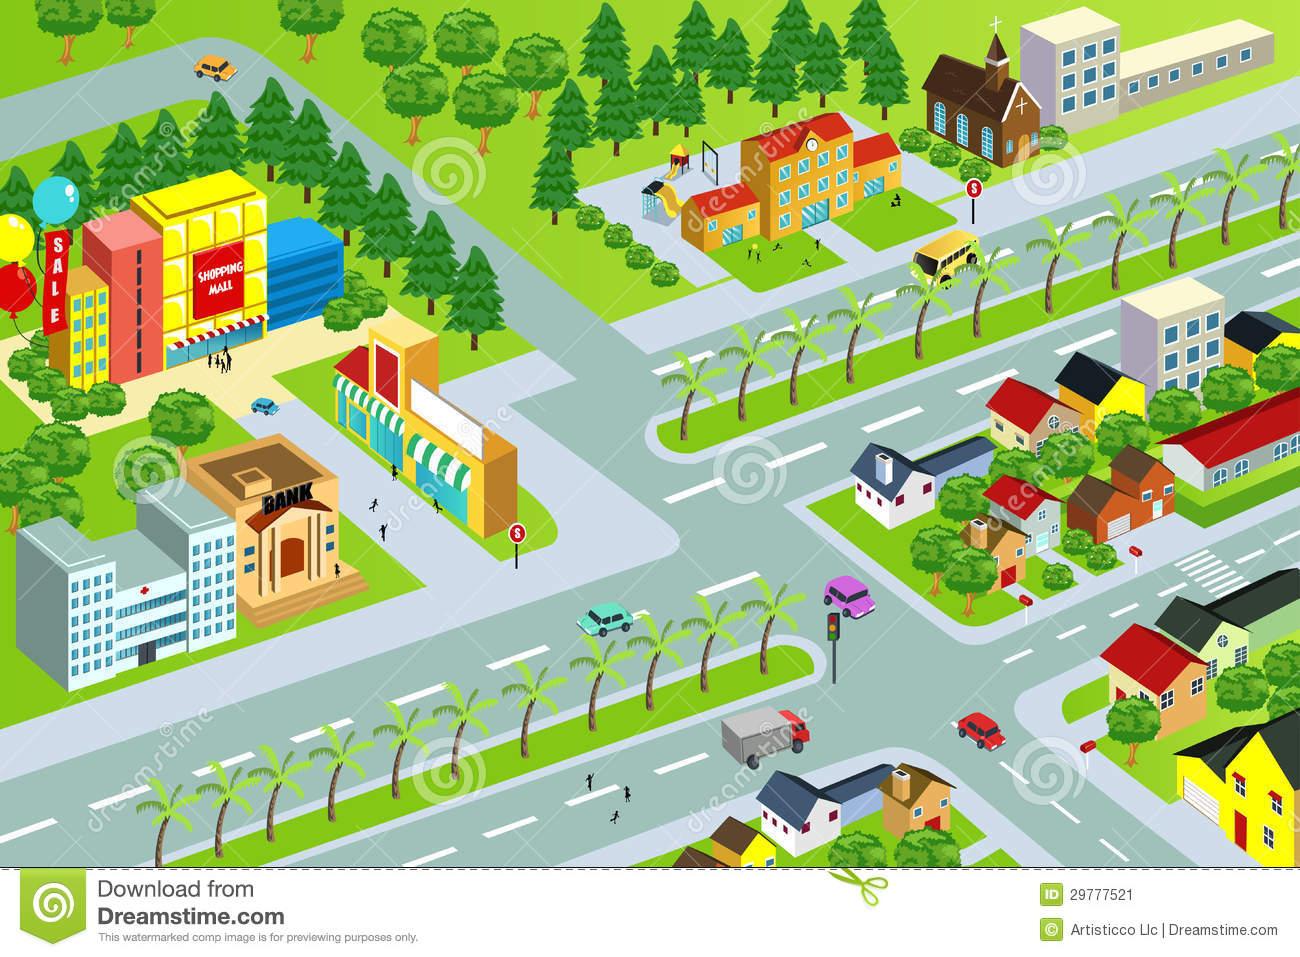 City map stock vector. Illustration of housing, mall.